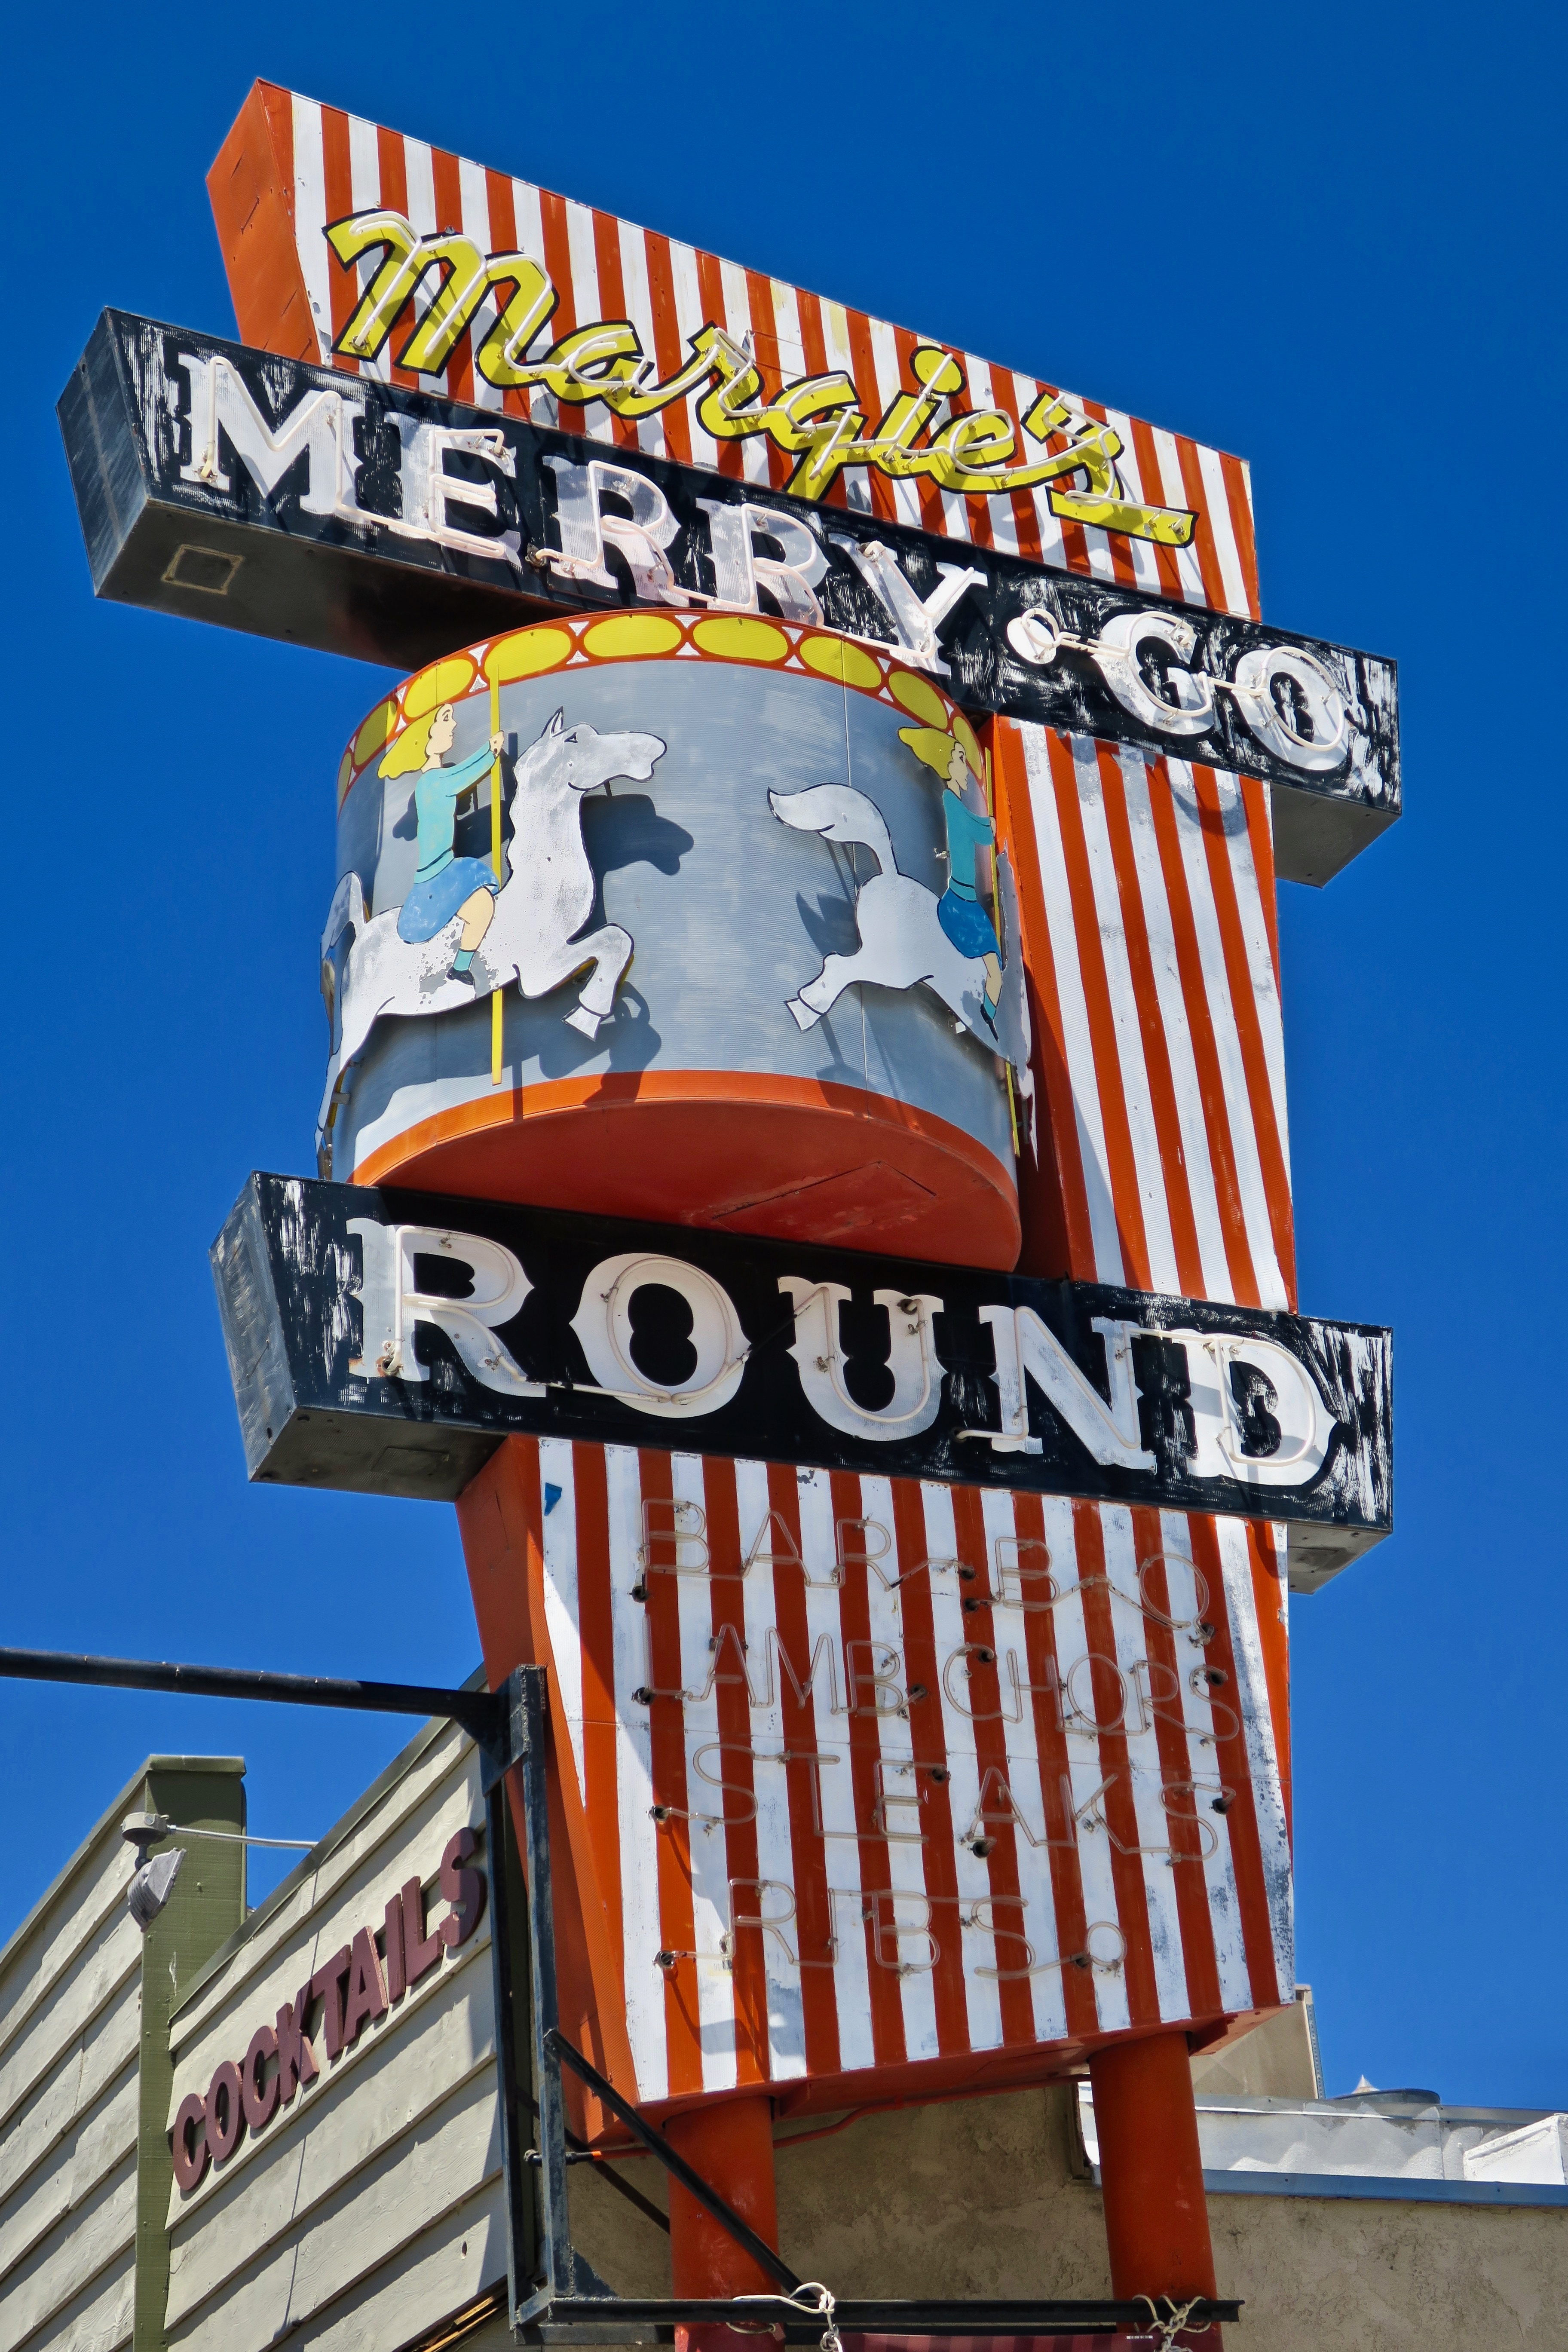 Margie's Merry-Go Round - 212 South Main Street, Lone Pine, California U.S.A. - July 30, 2017